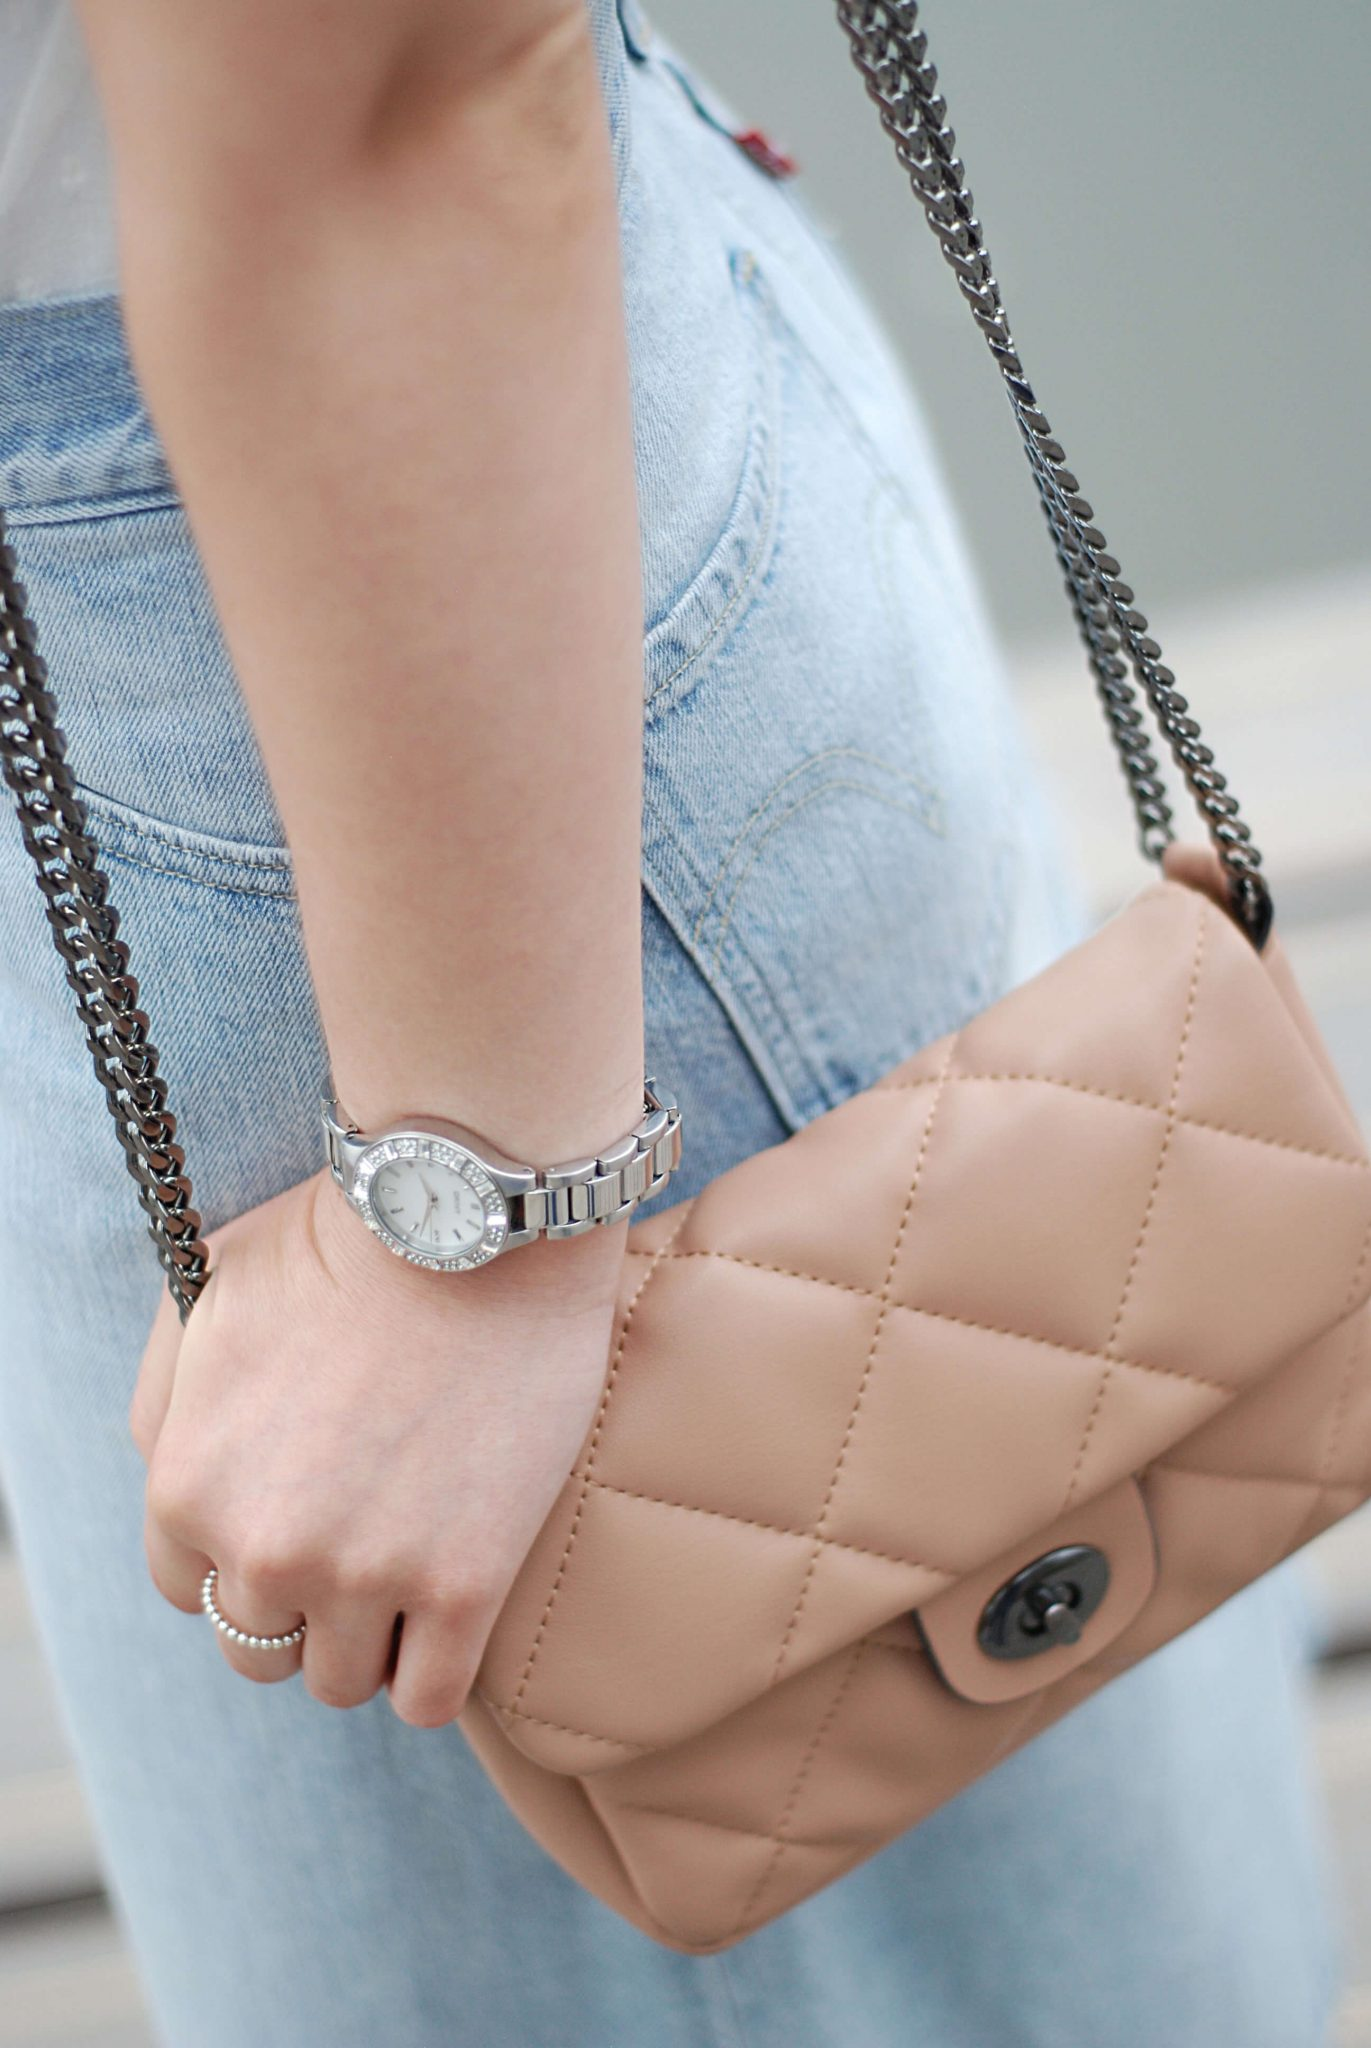 DKNY-watch-sell